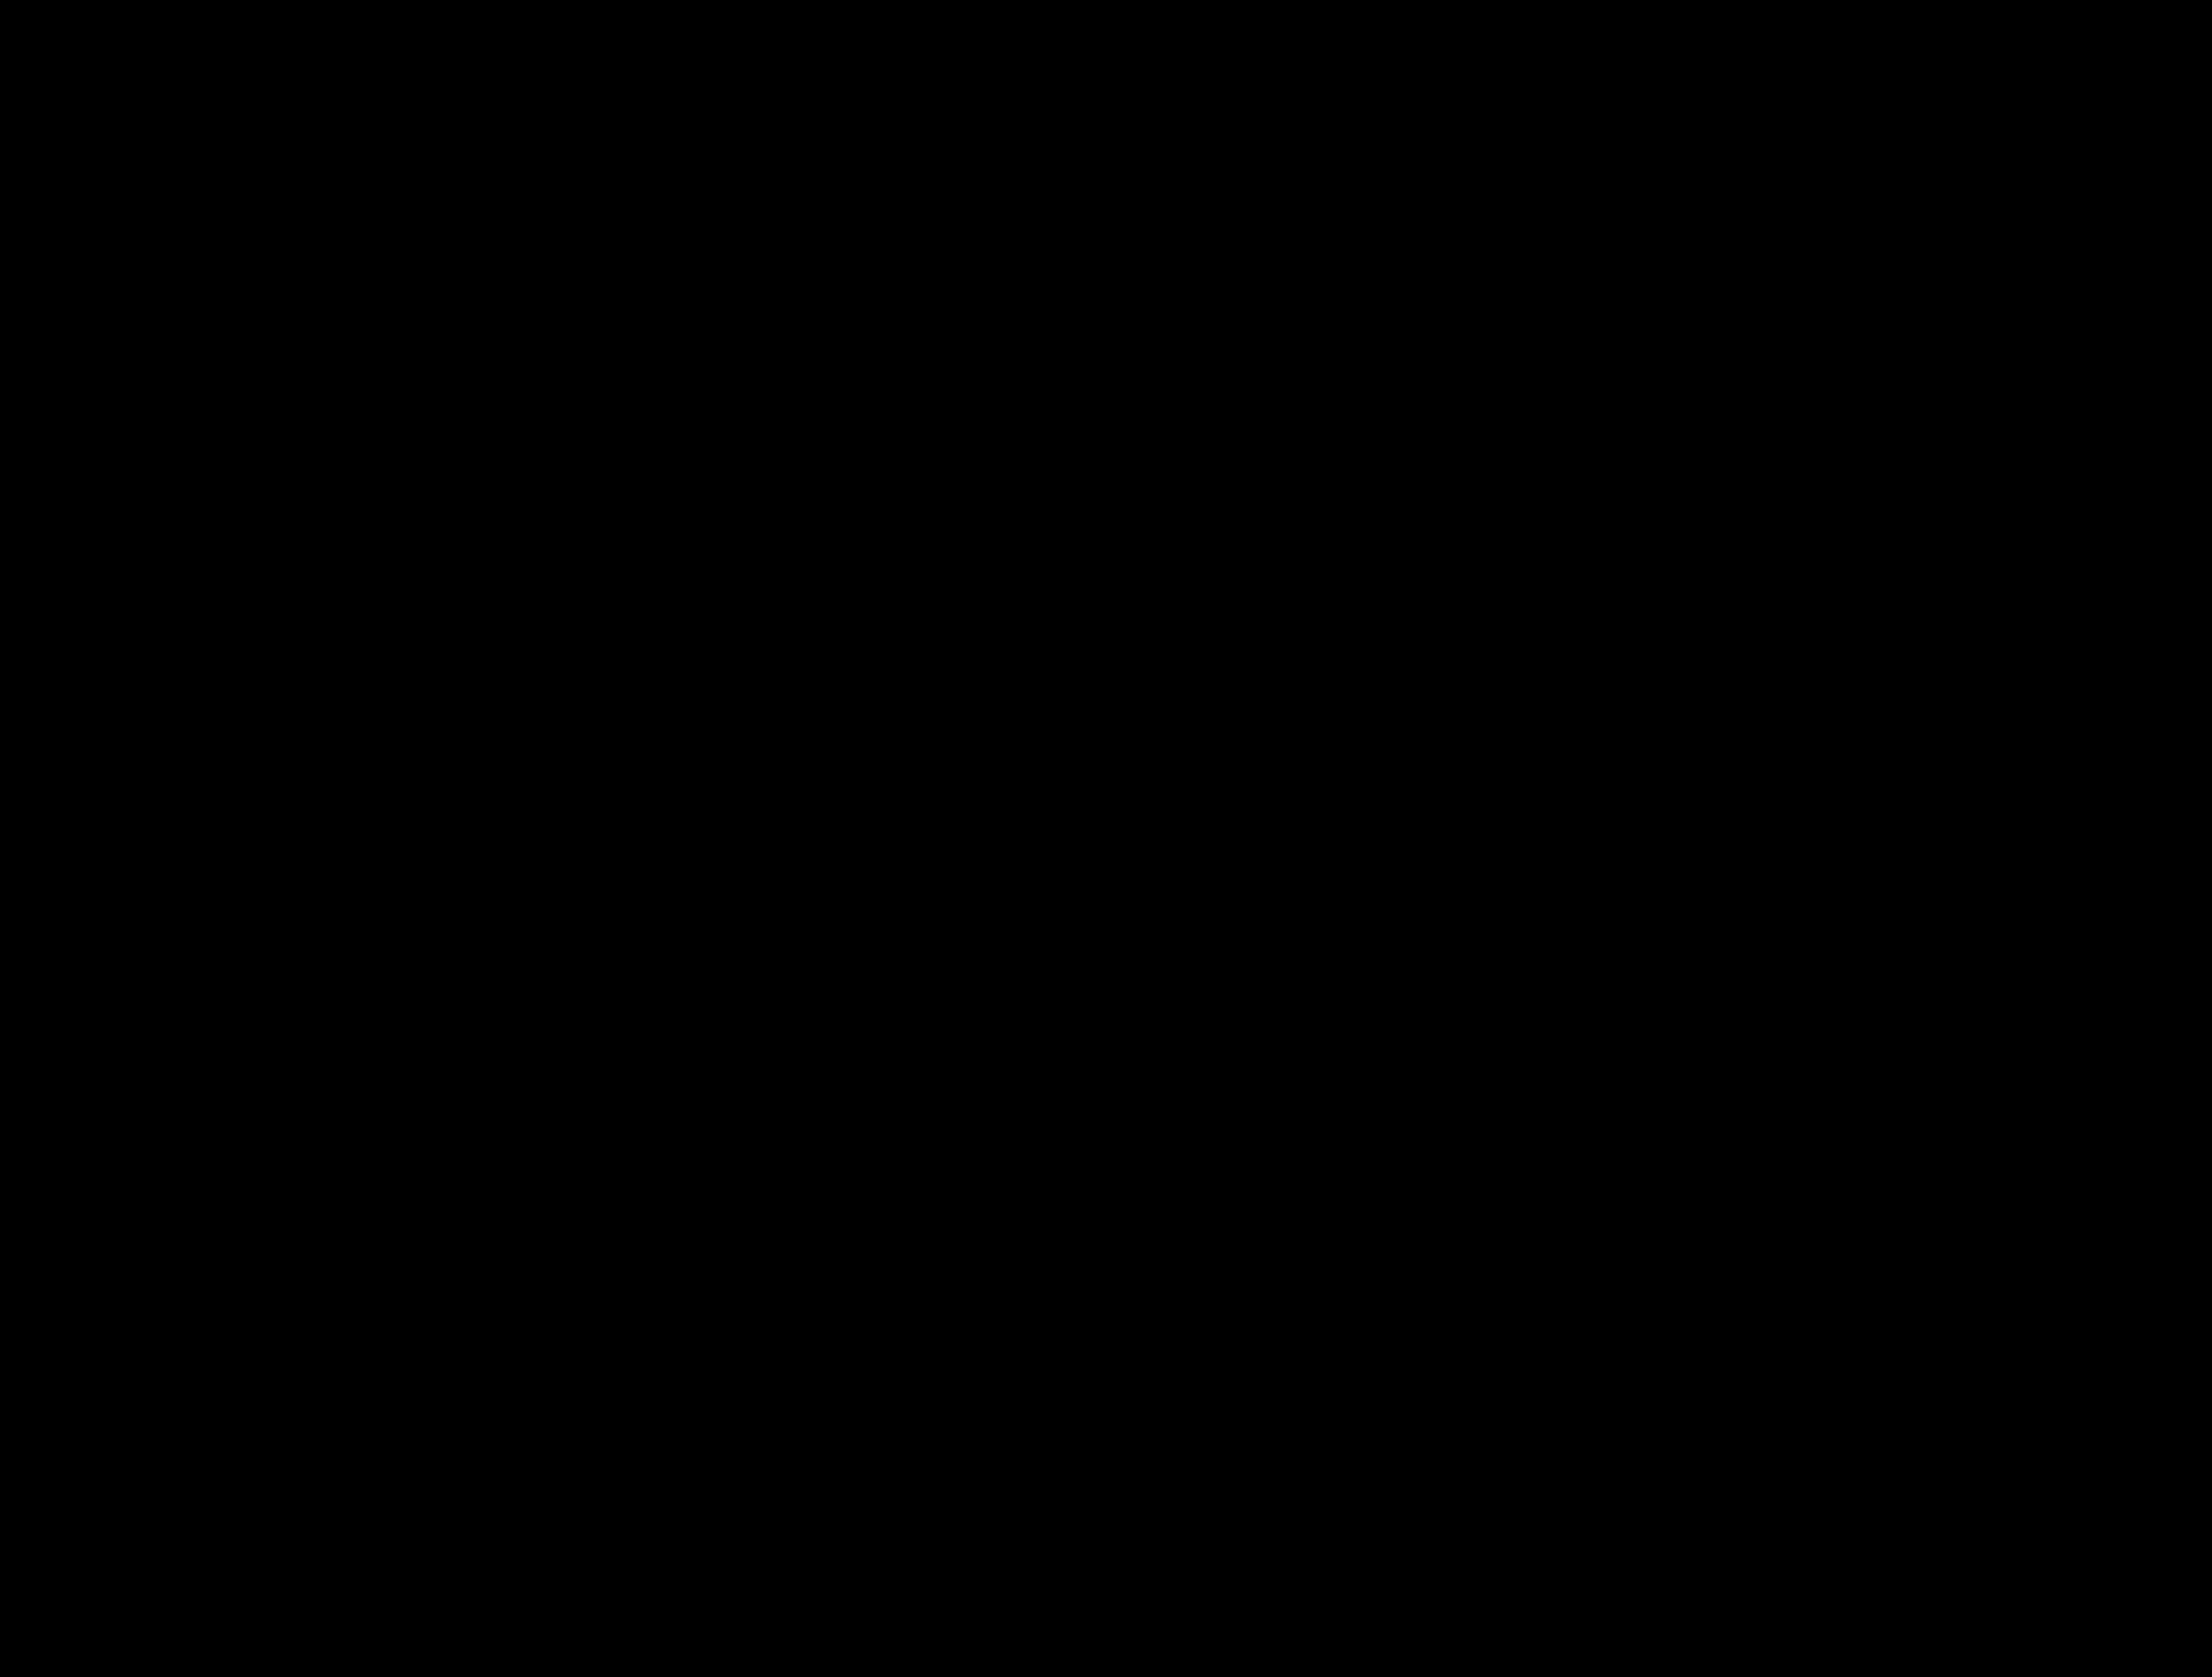 2400x1820 Clipart